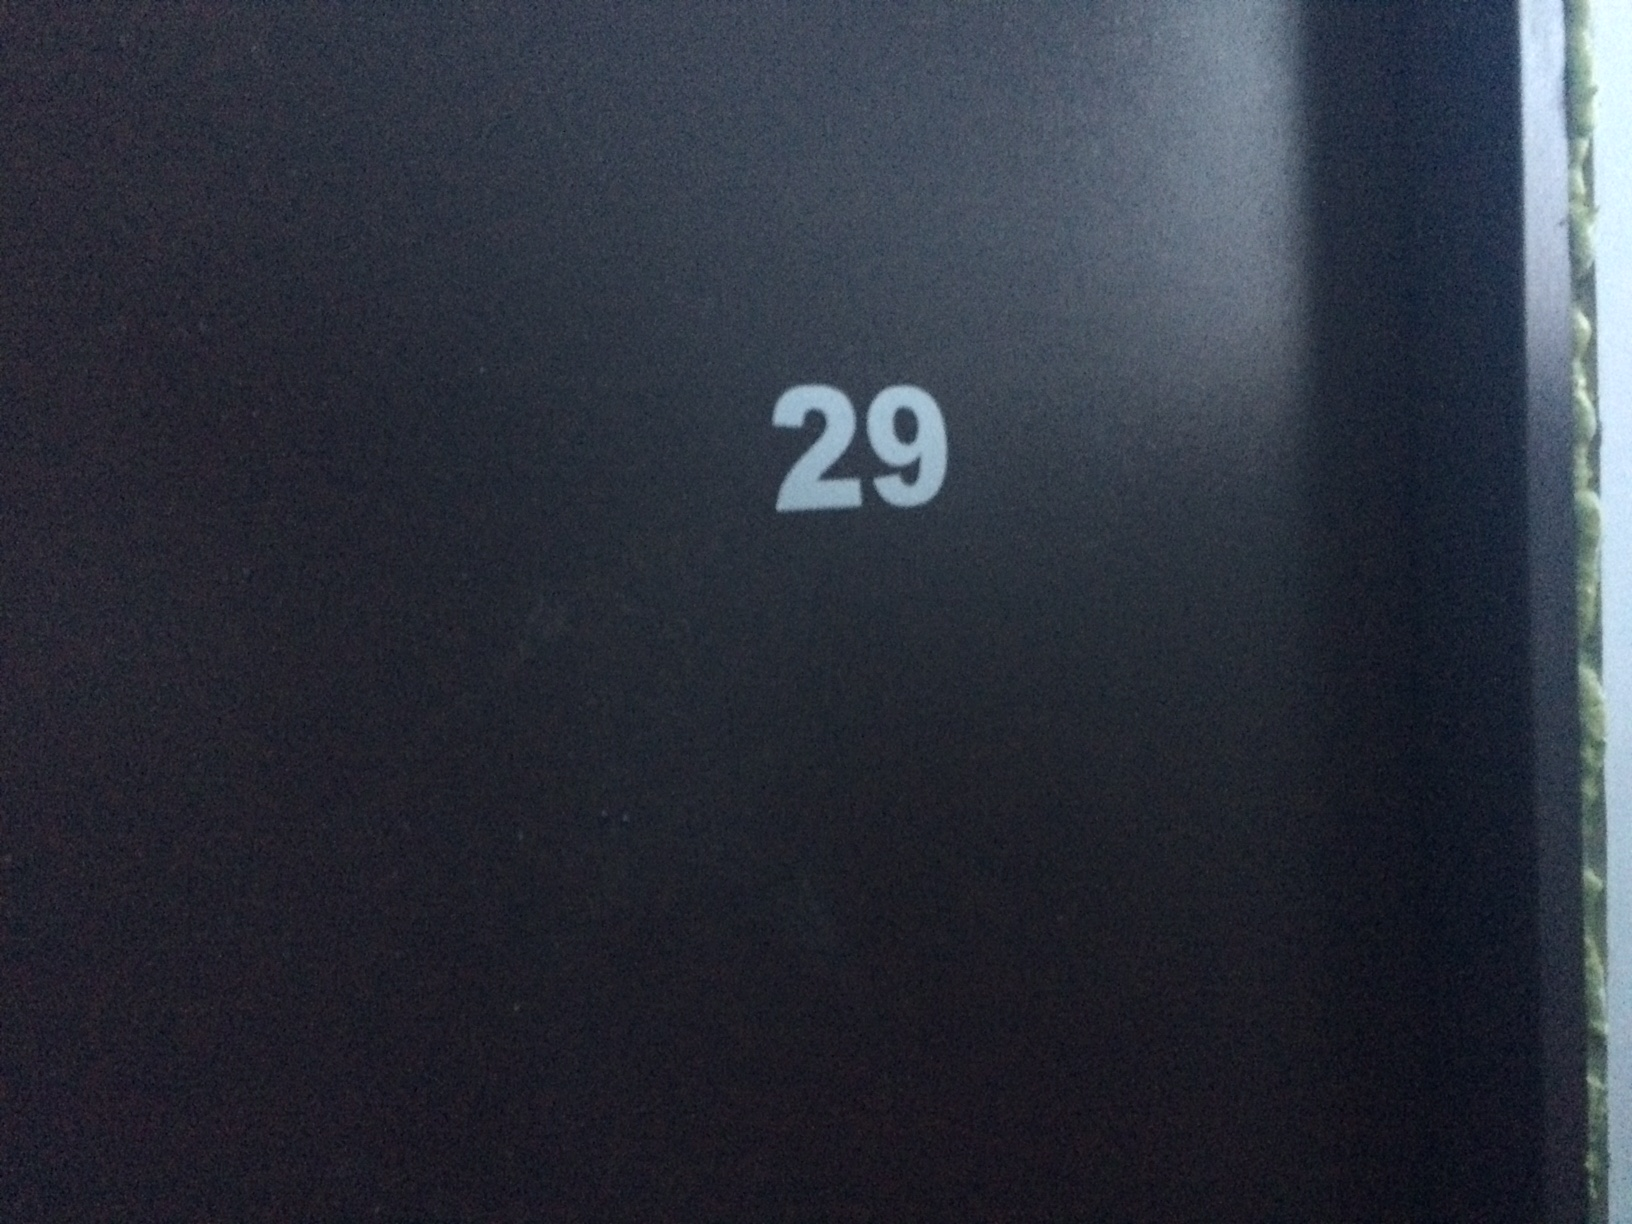 Boxa nr.29, Ansamblul Izvorul Dorului, Sinaia